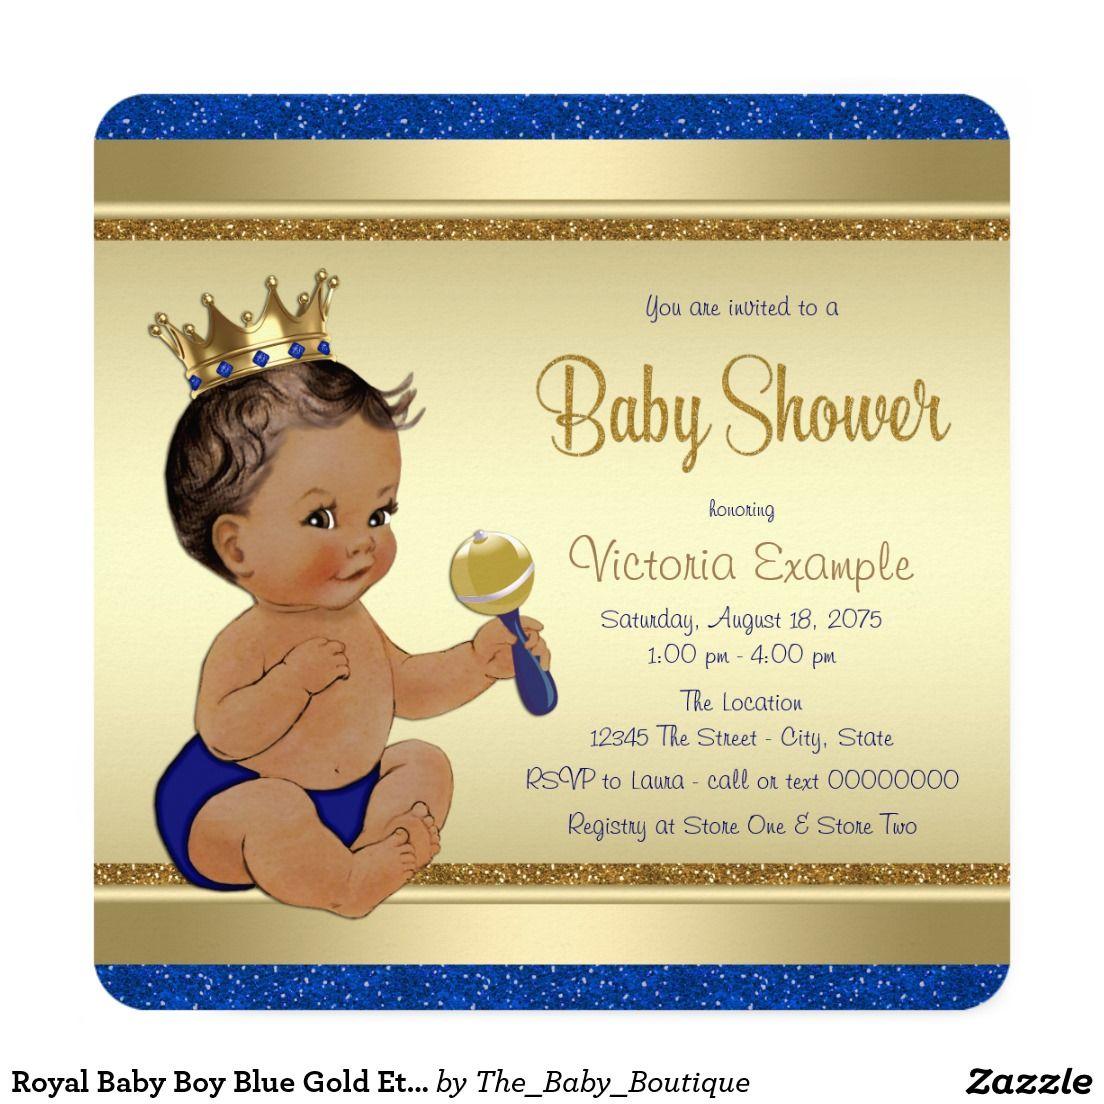 Royal Baby Boy Blue Gold Ethnic Prince Baby Shower Invitation   Boy ...